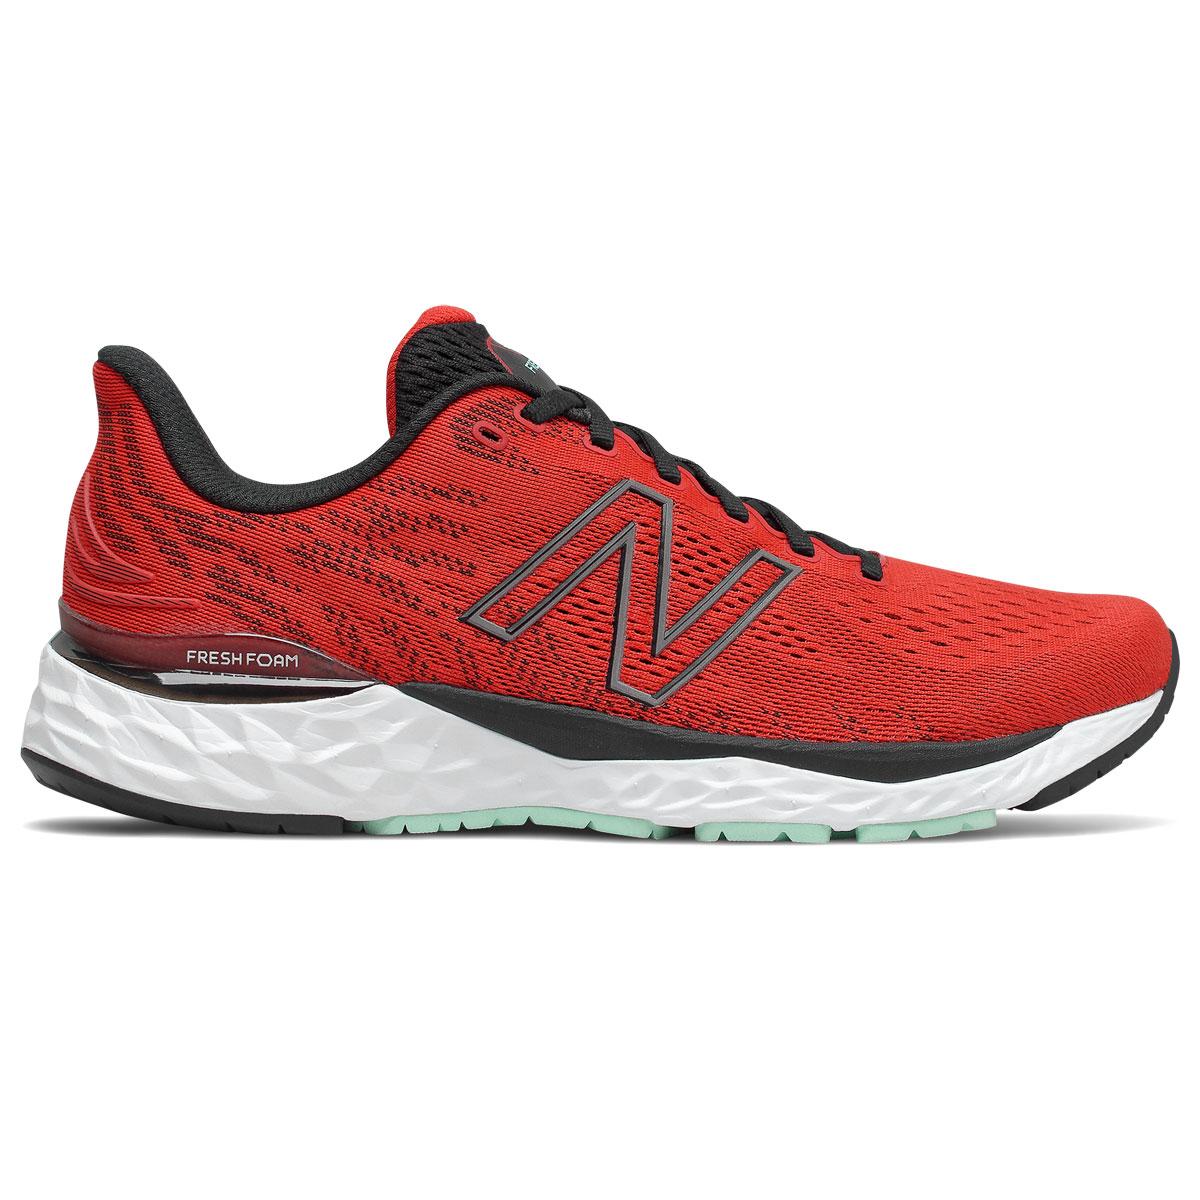 Men's New Balance Fresh Foam 880v11 Running Shoe - Color: Velocity Red/Black - Size: 8 - Width: Wide, Velocity Red/Black, large, image 1